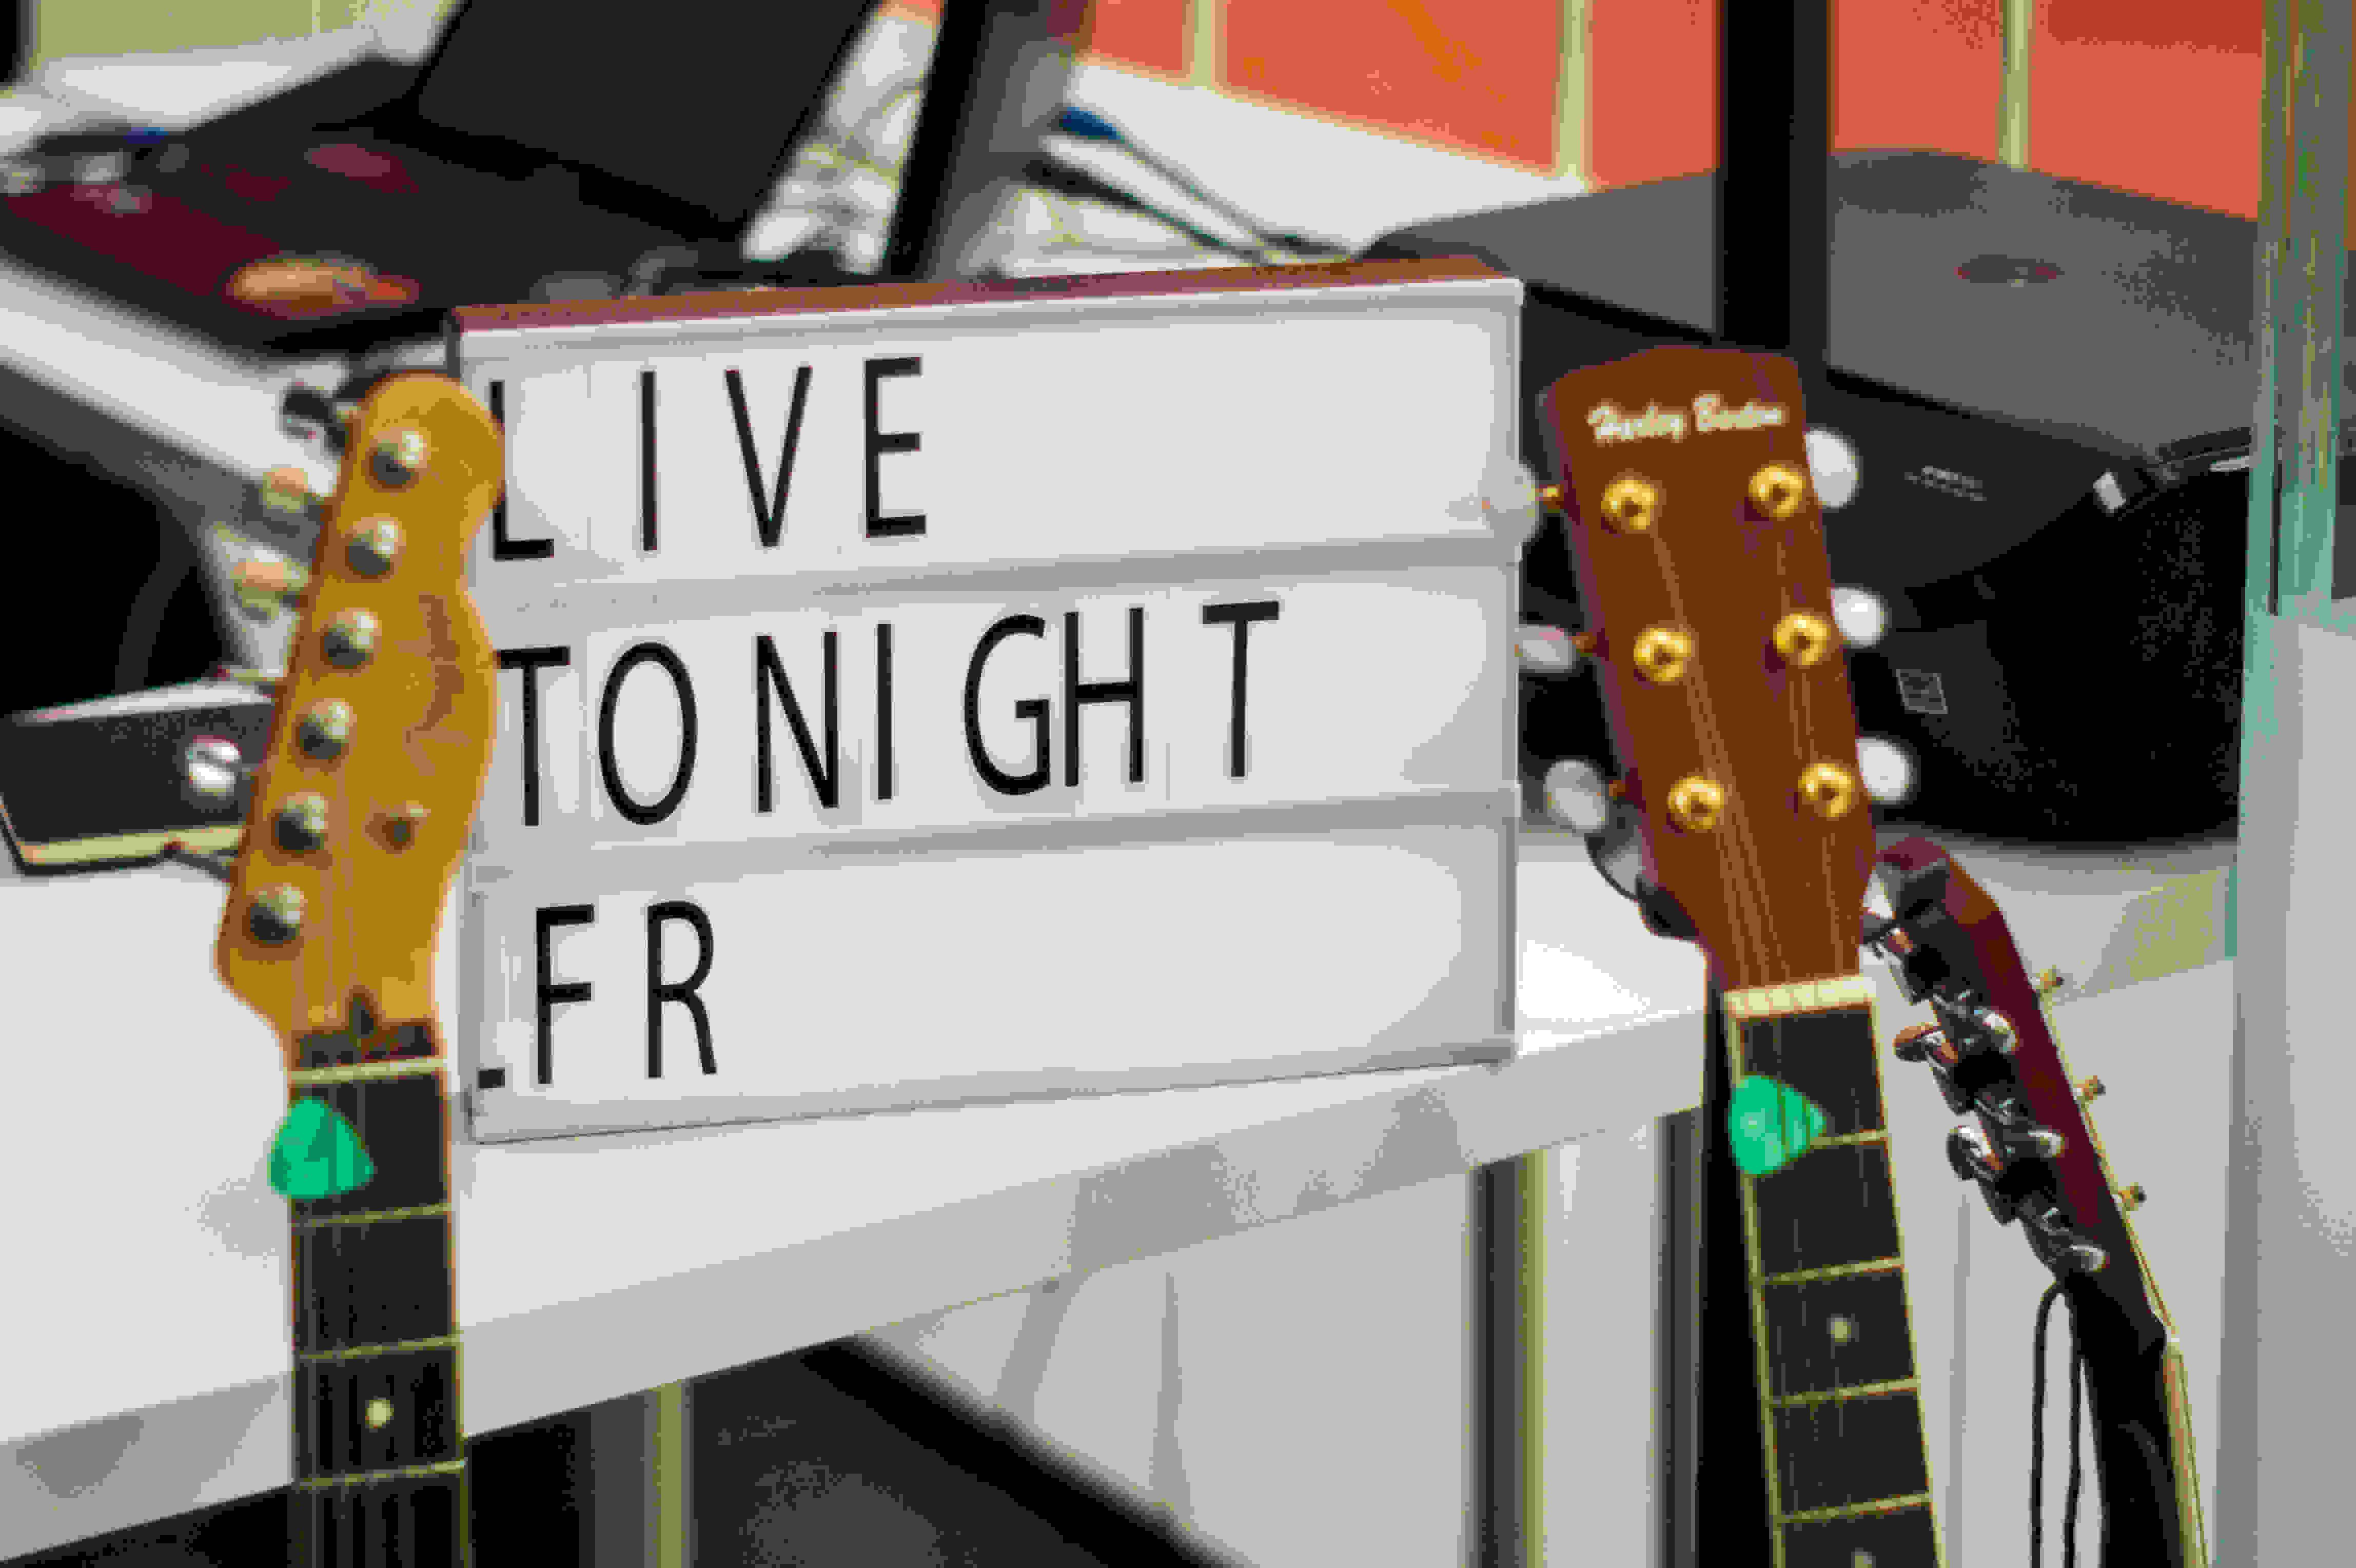 Live tonight 11